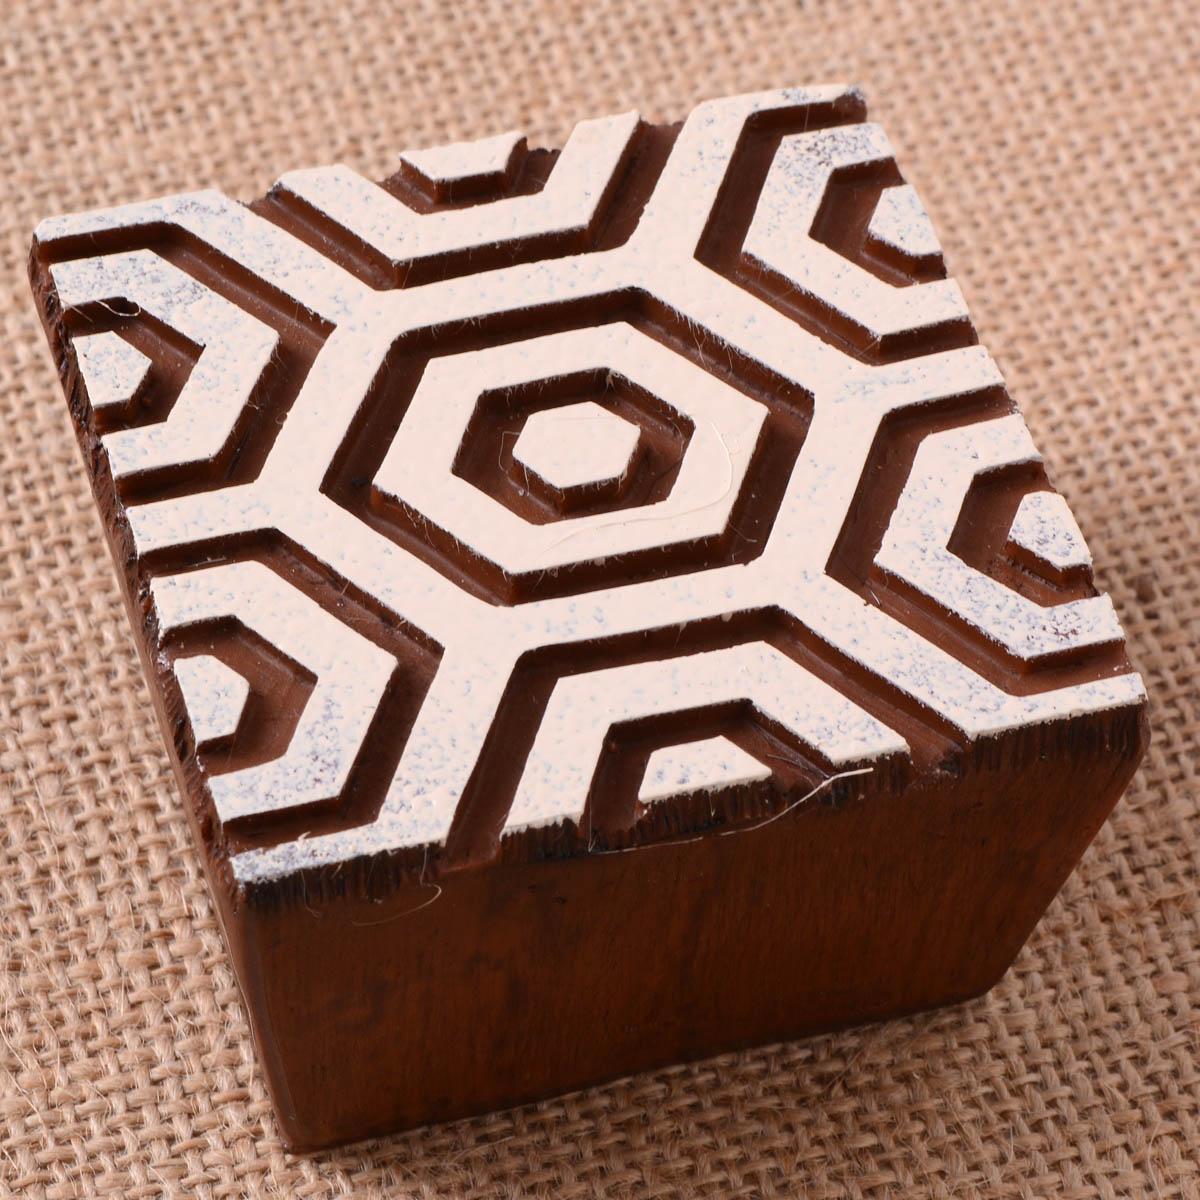 Fabric Creations™ Block Printing Stamps - Medium - Hex Honeycomb